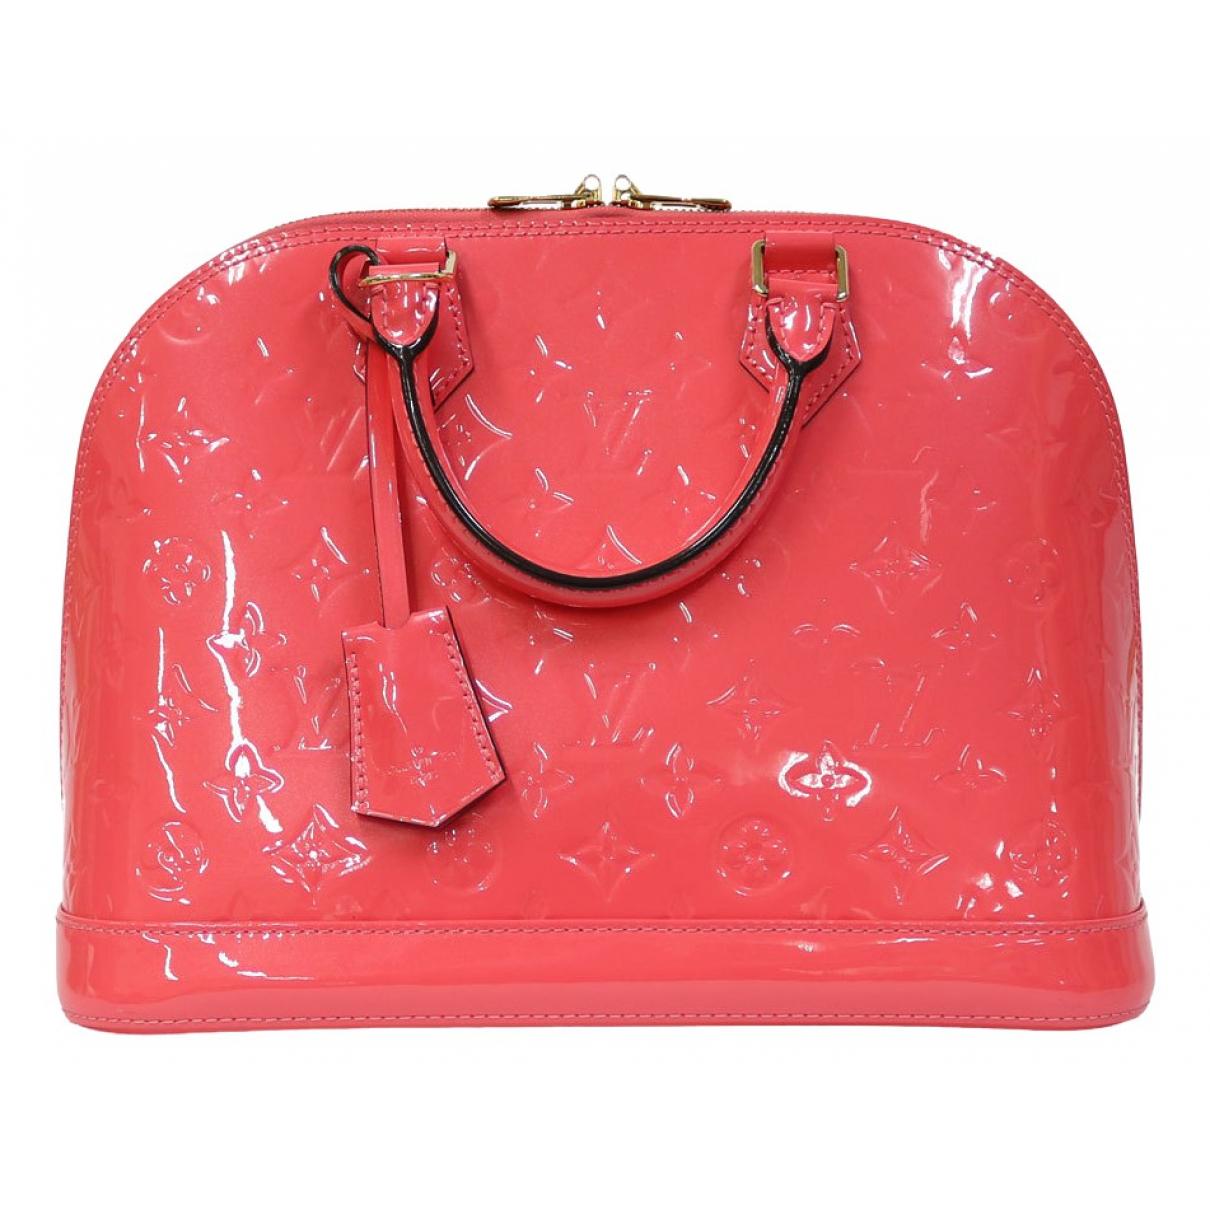 Louis Vuitton Alma Pink Patent leather handbag for Women \N